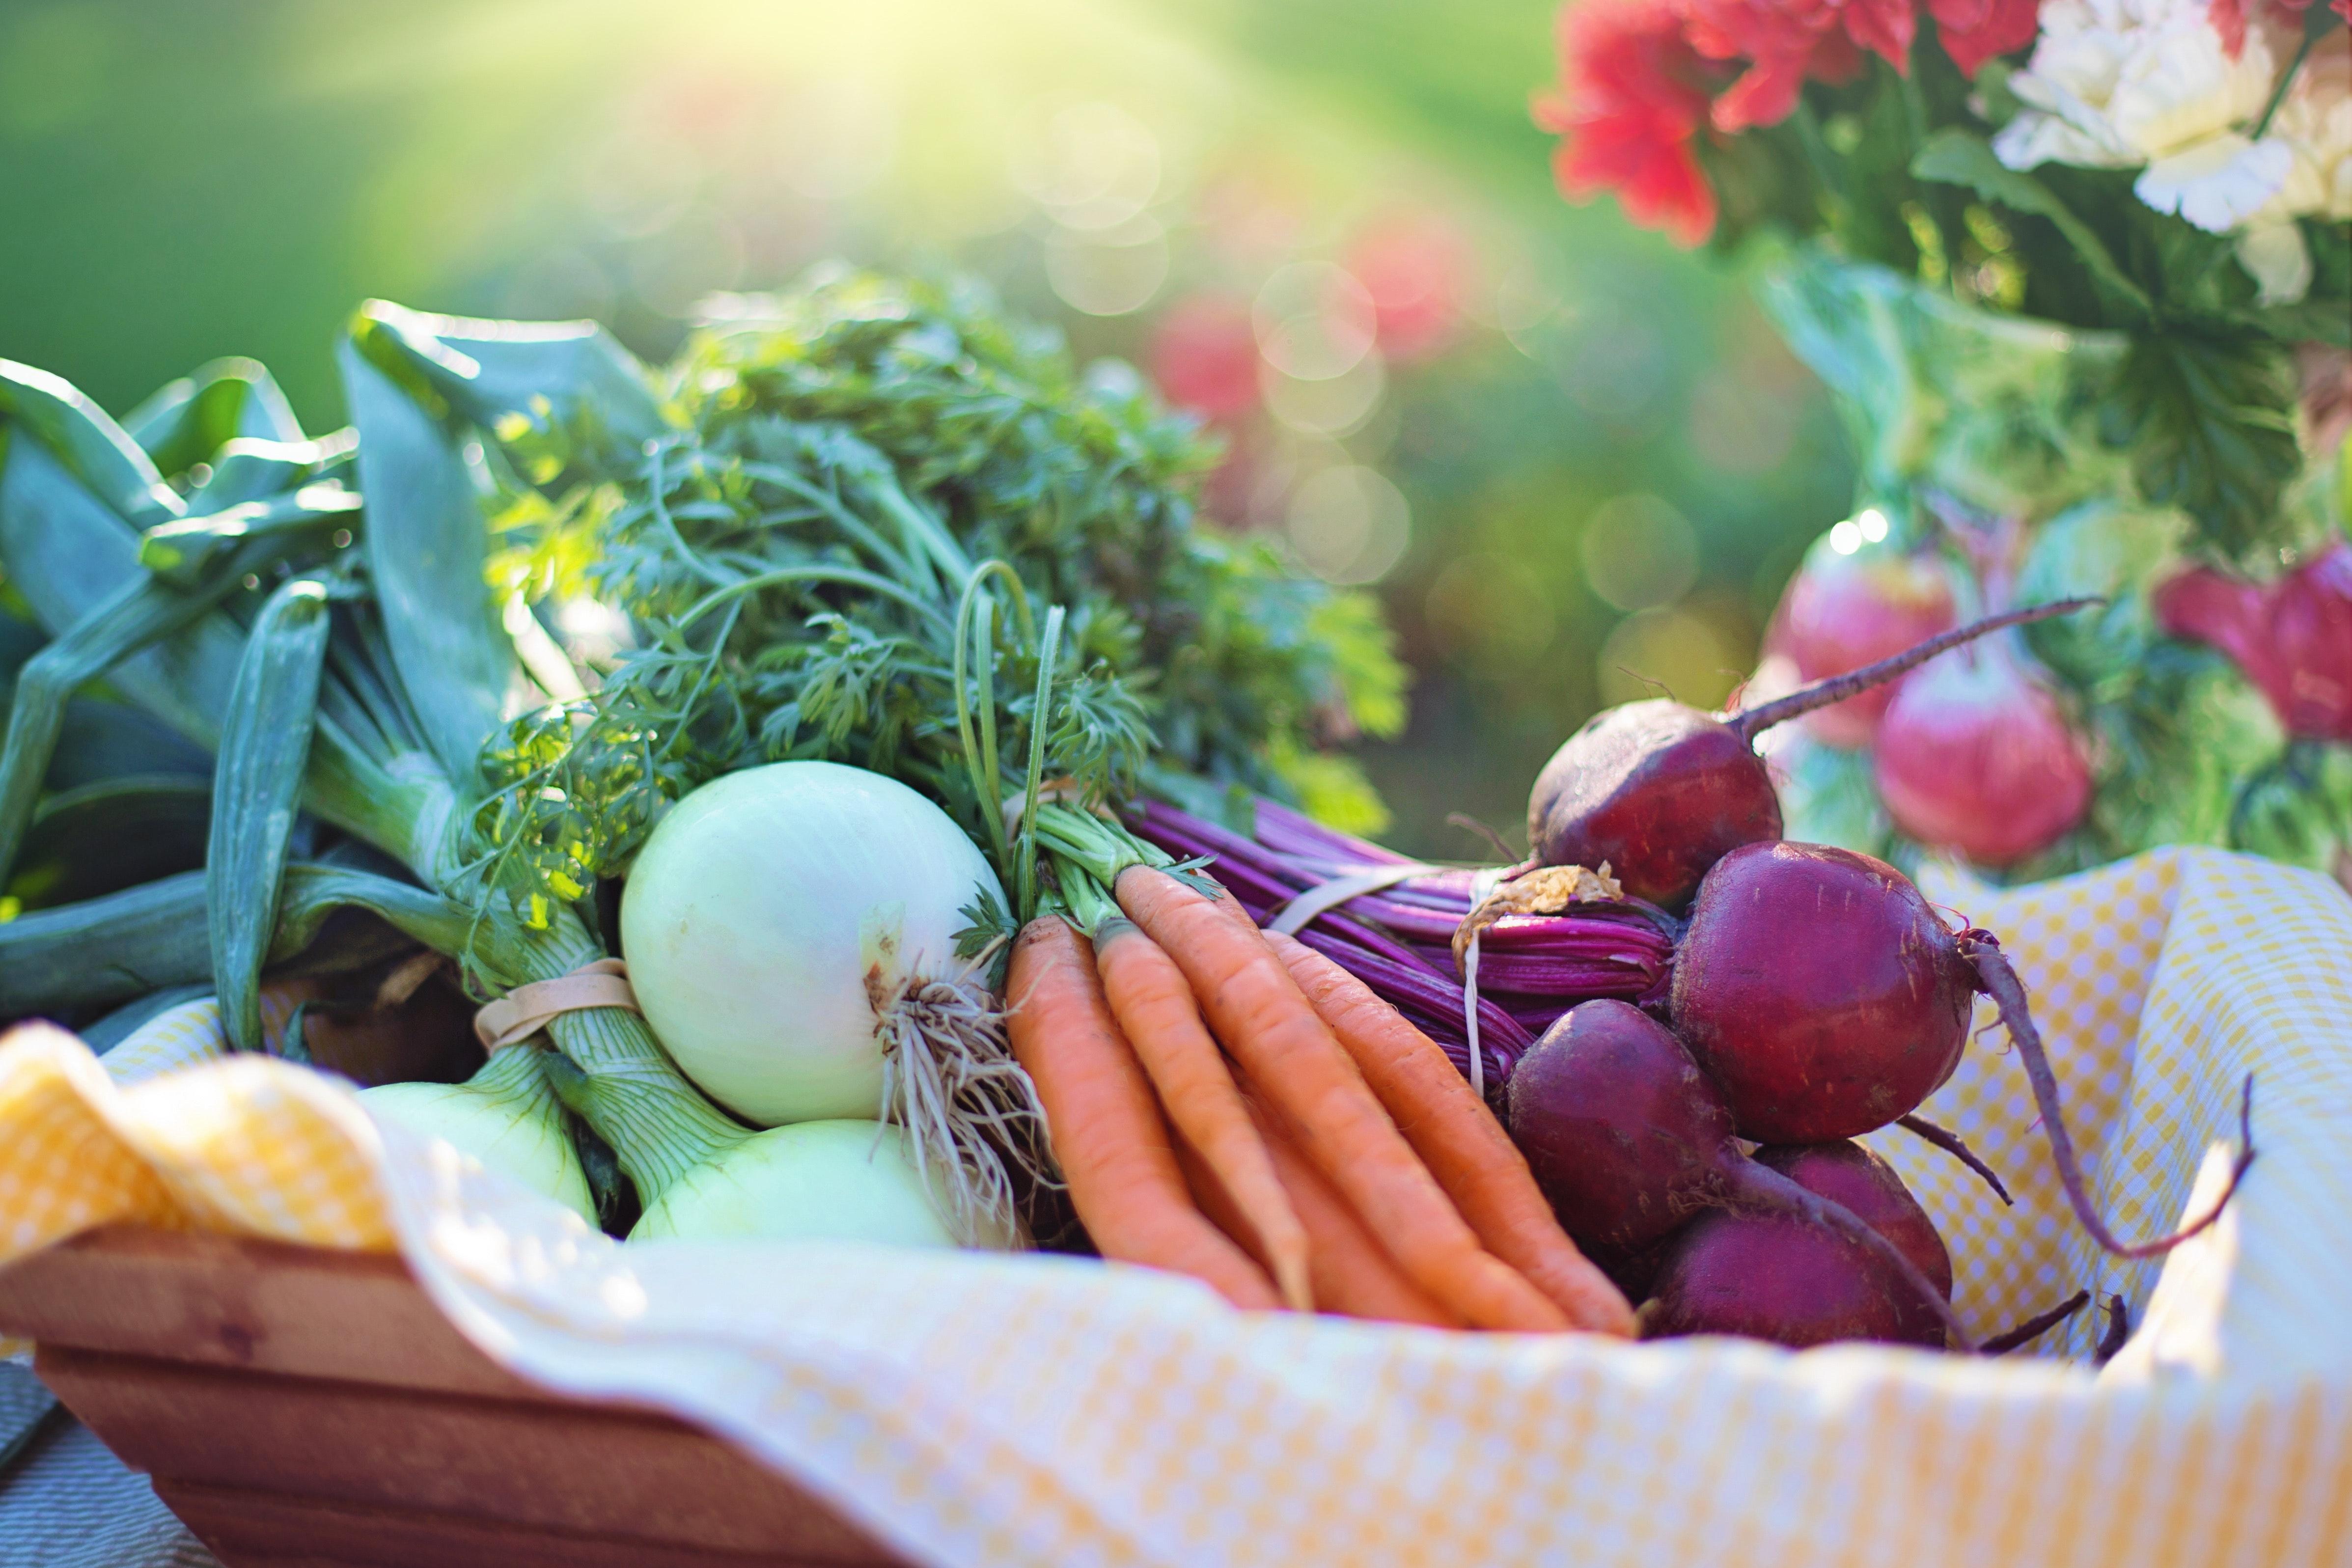 agriculture-basket-beets-533360